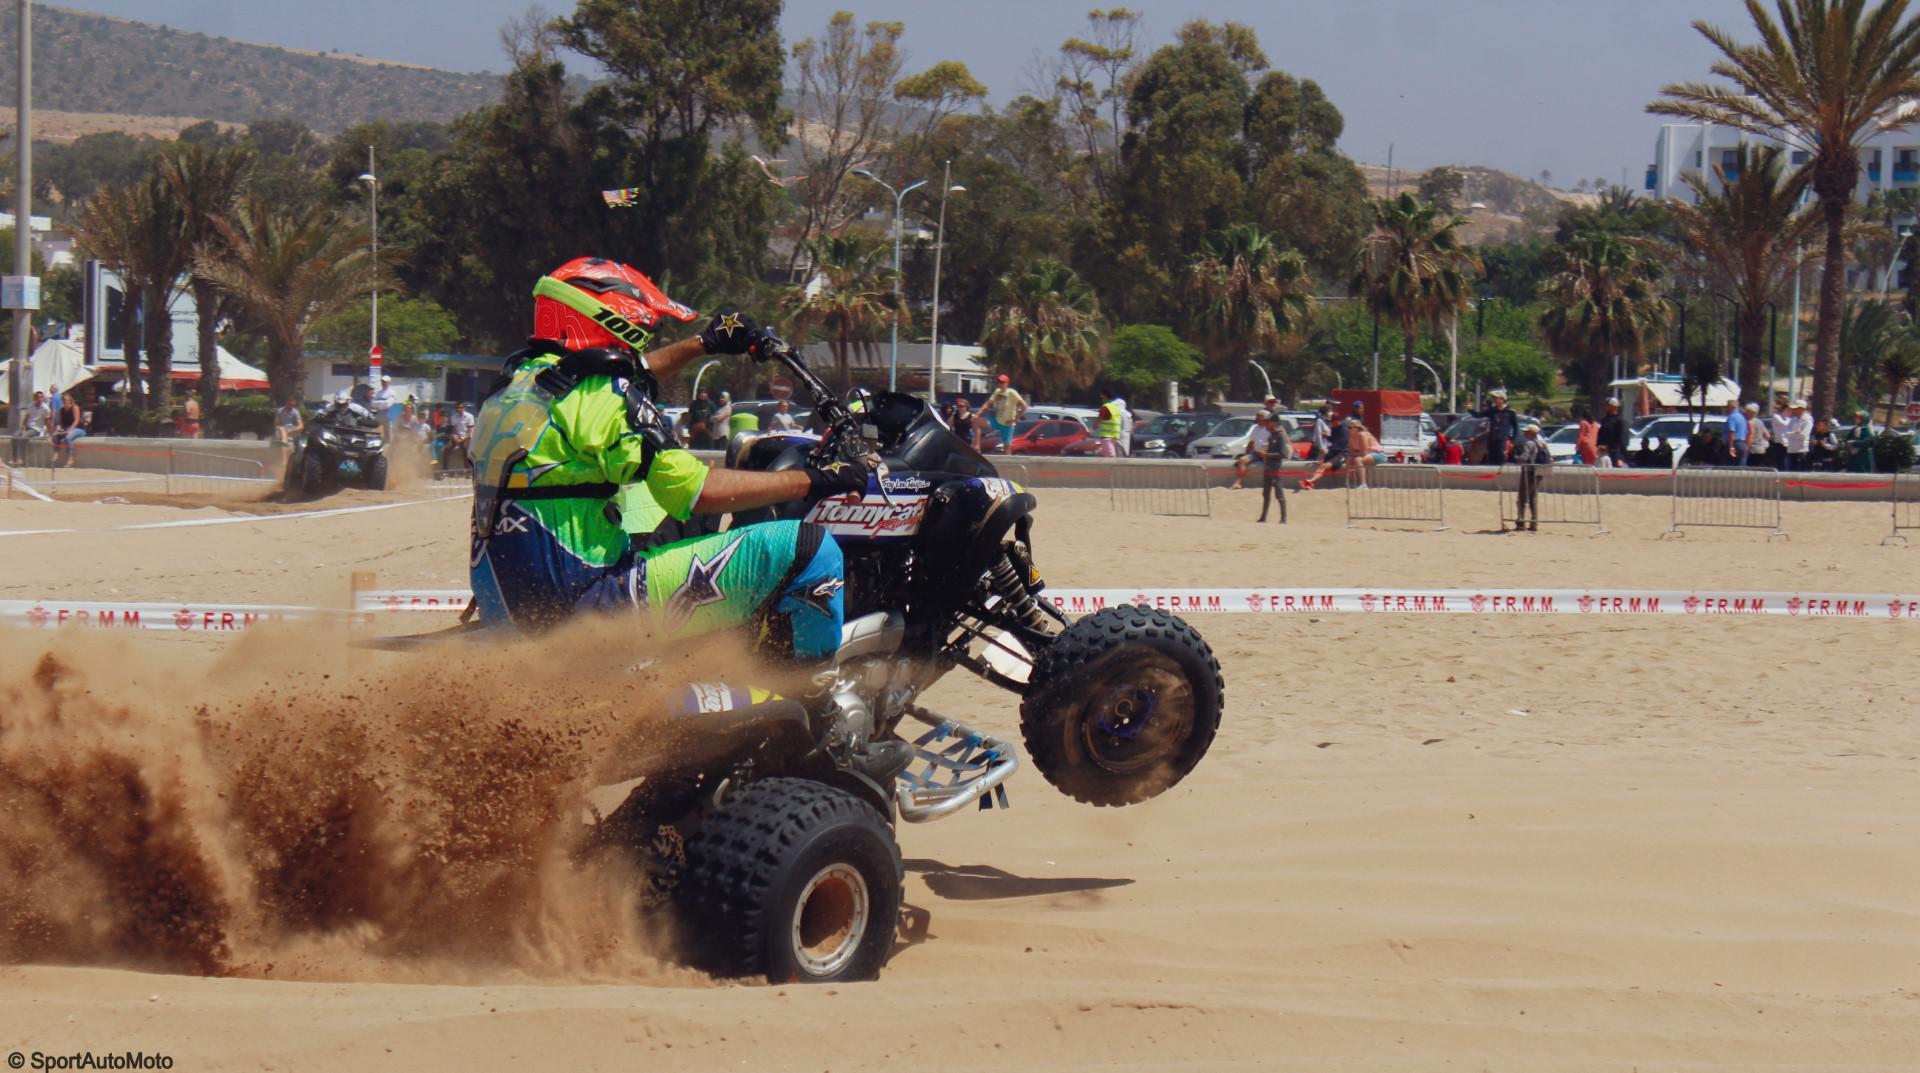 agadir-beach-race-la-reussite-791-18.jpg